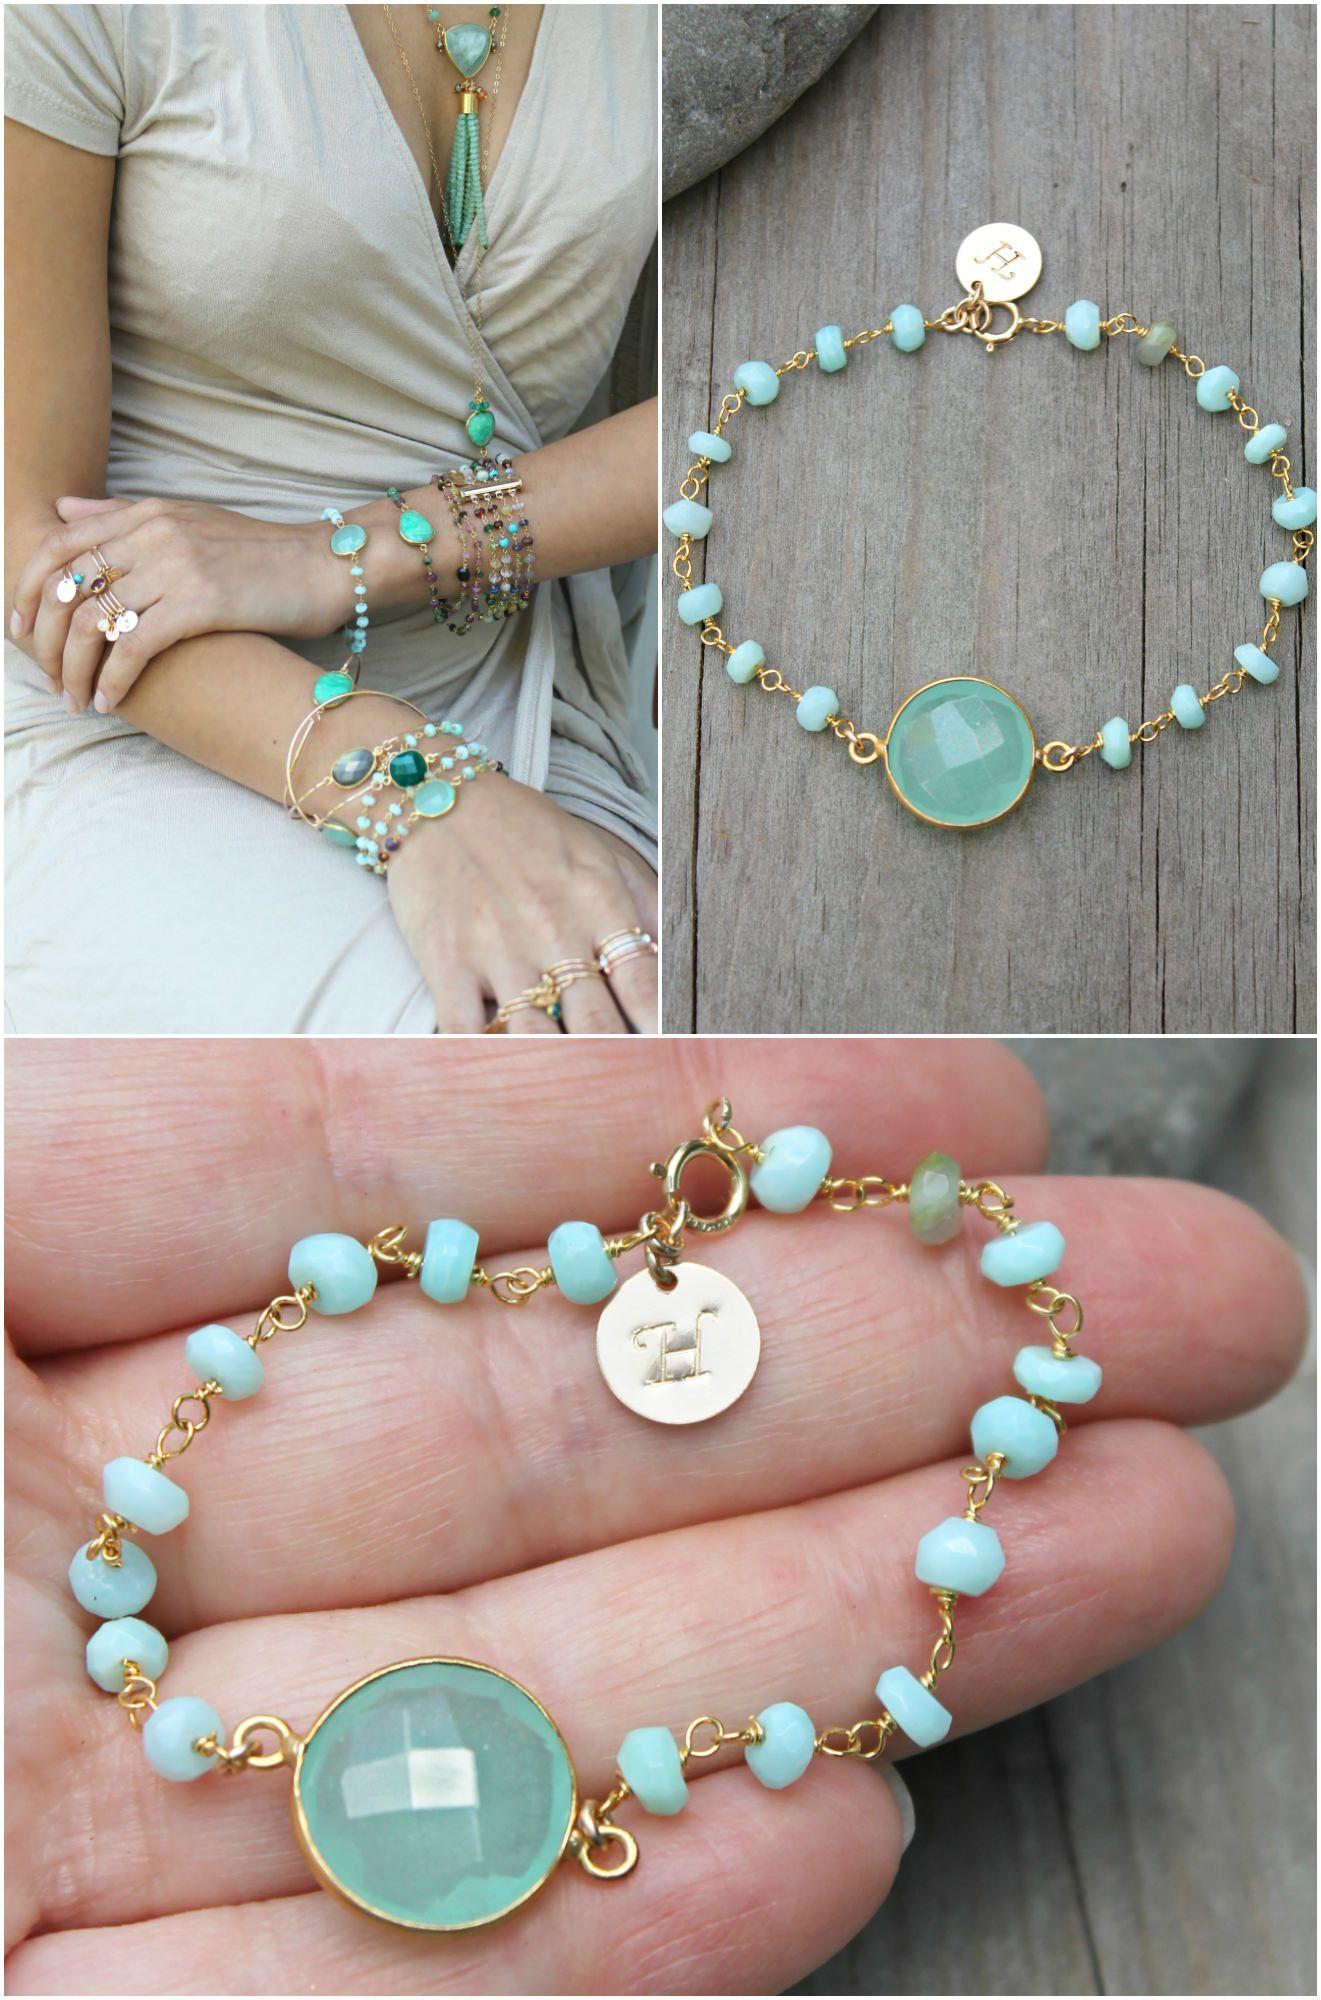 Aqua Chalcedony & Blue Opal gemstone bracelet,Personalized custom stamped initial disc, beaded bracelet, rosary bead chain, pale mint green